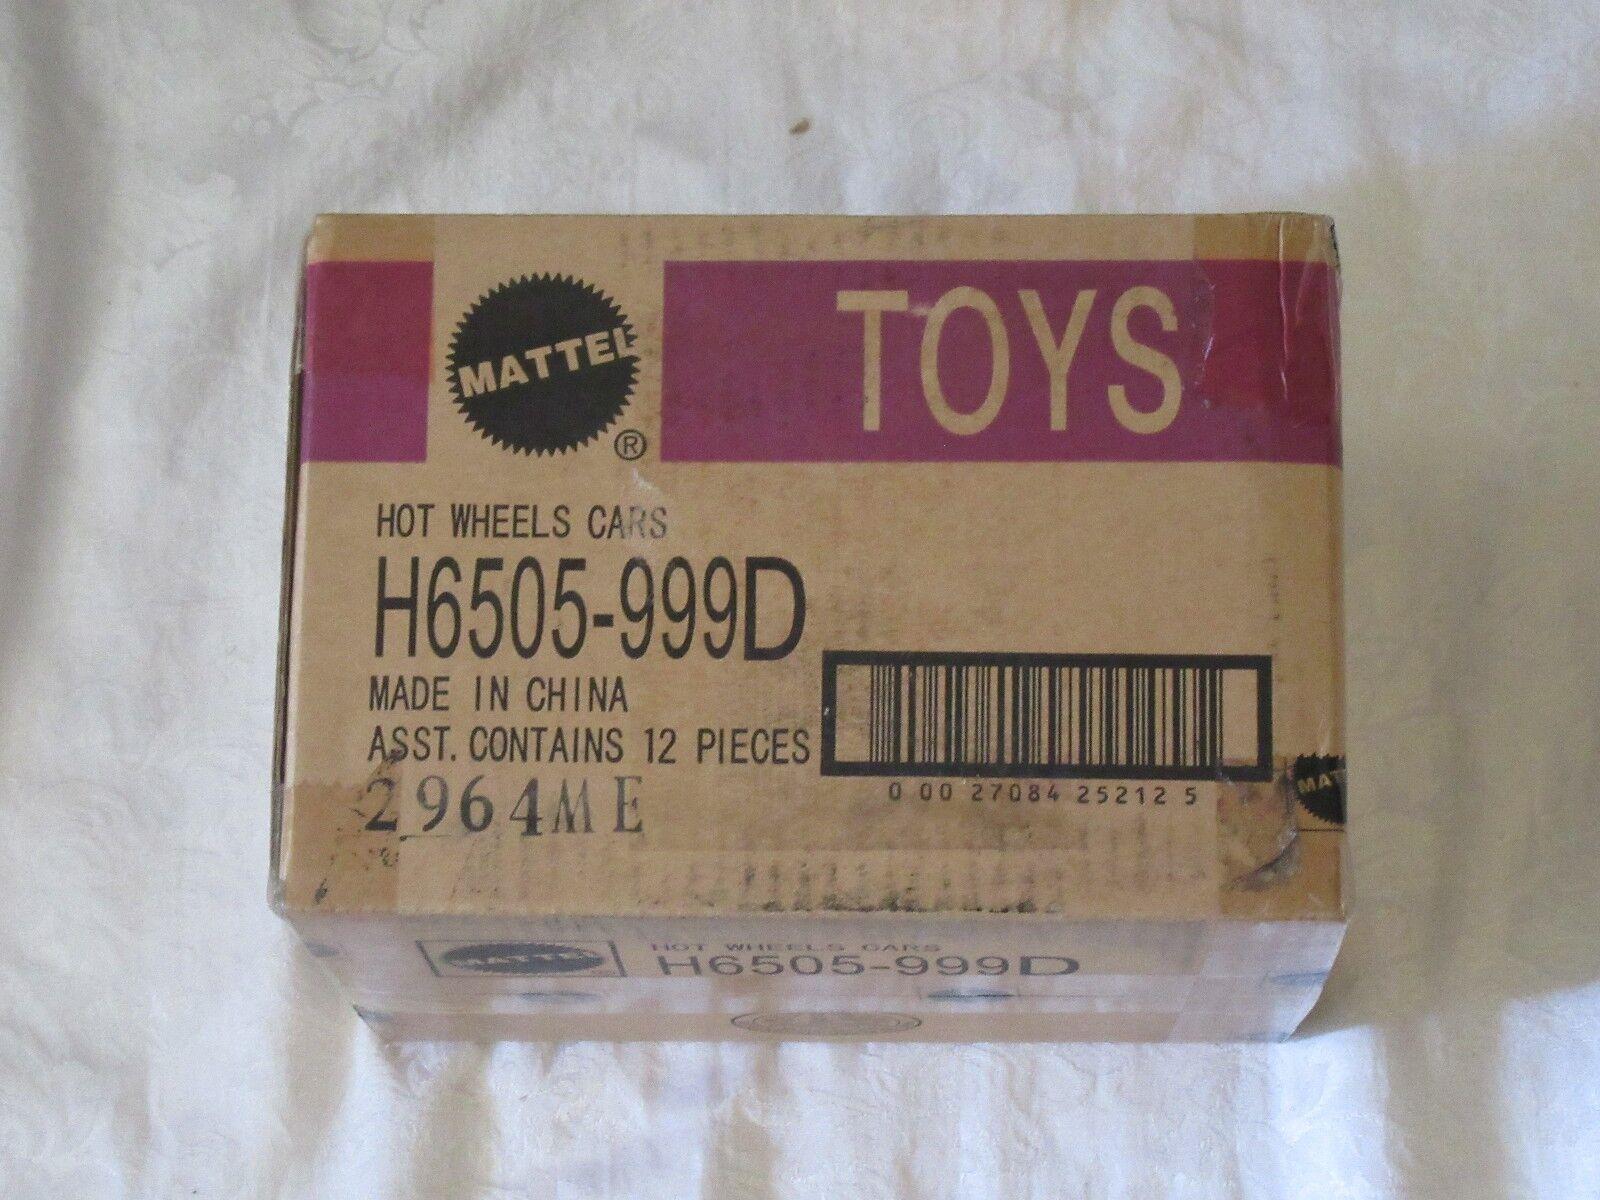 Mattel Hot Wheels Voitures SEALED CASE H6505-999D 2964ME 2964 Master Edition 12 pieces